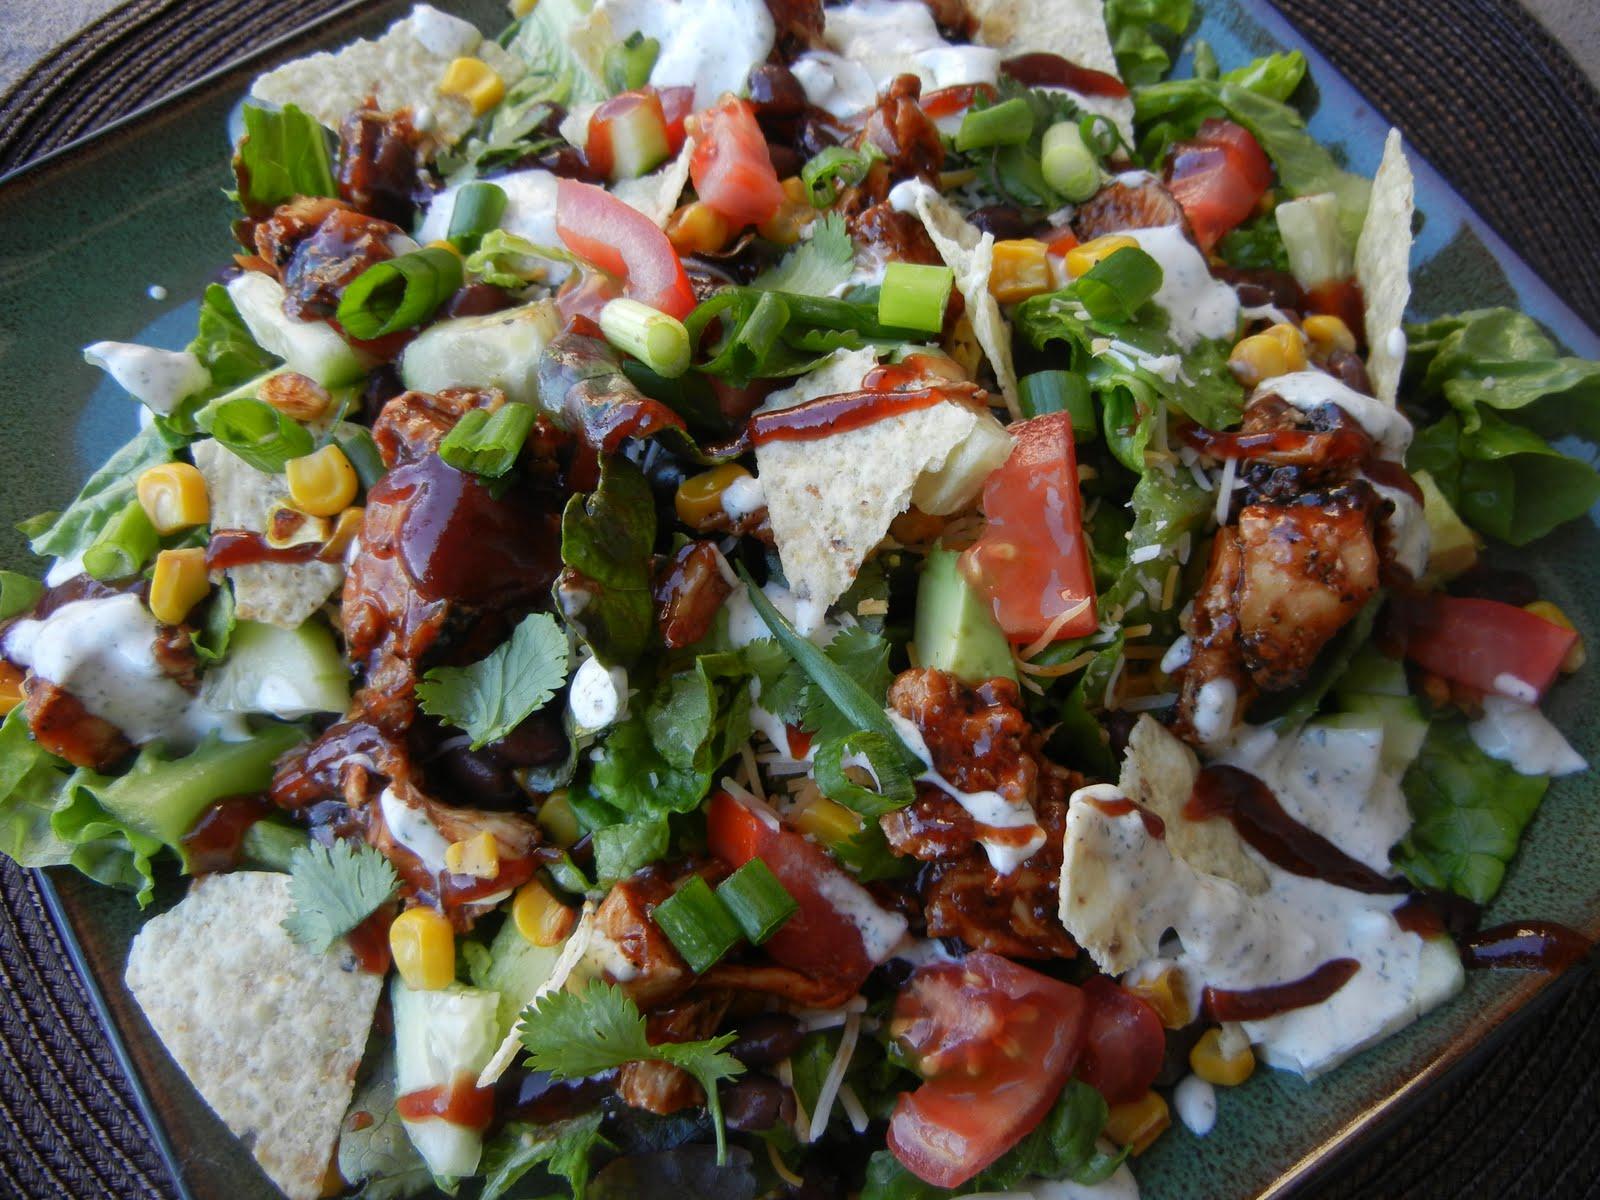 Groovy California Pizza Kitchen Bbq Chicken Chopped Salad Interior Design Ideas Skatsoteloinfo